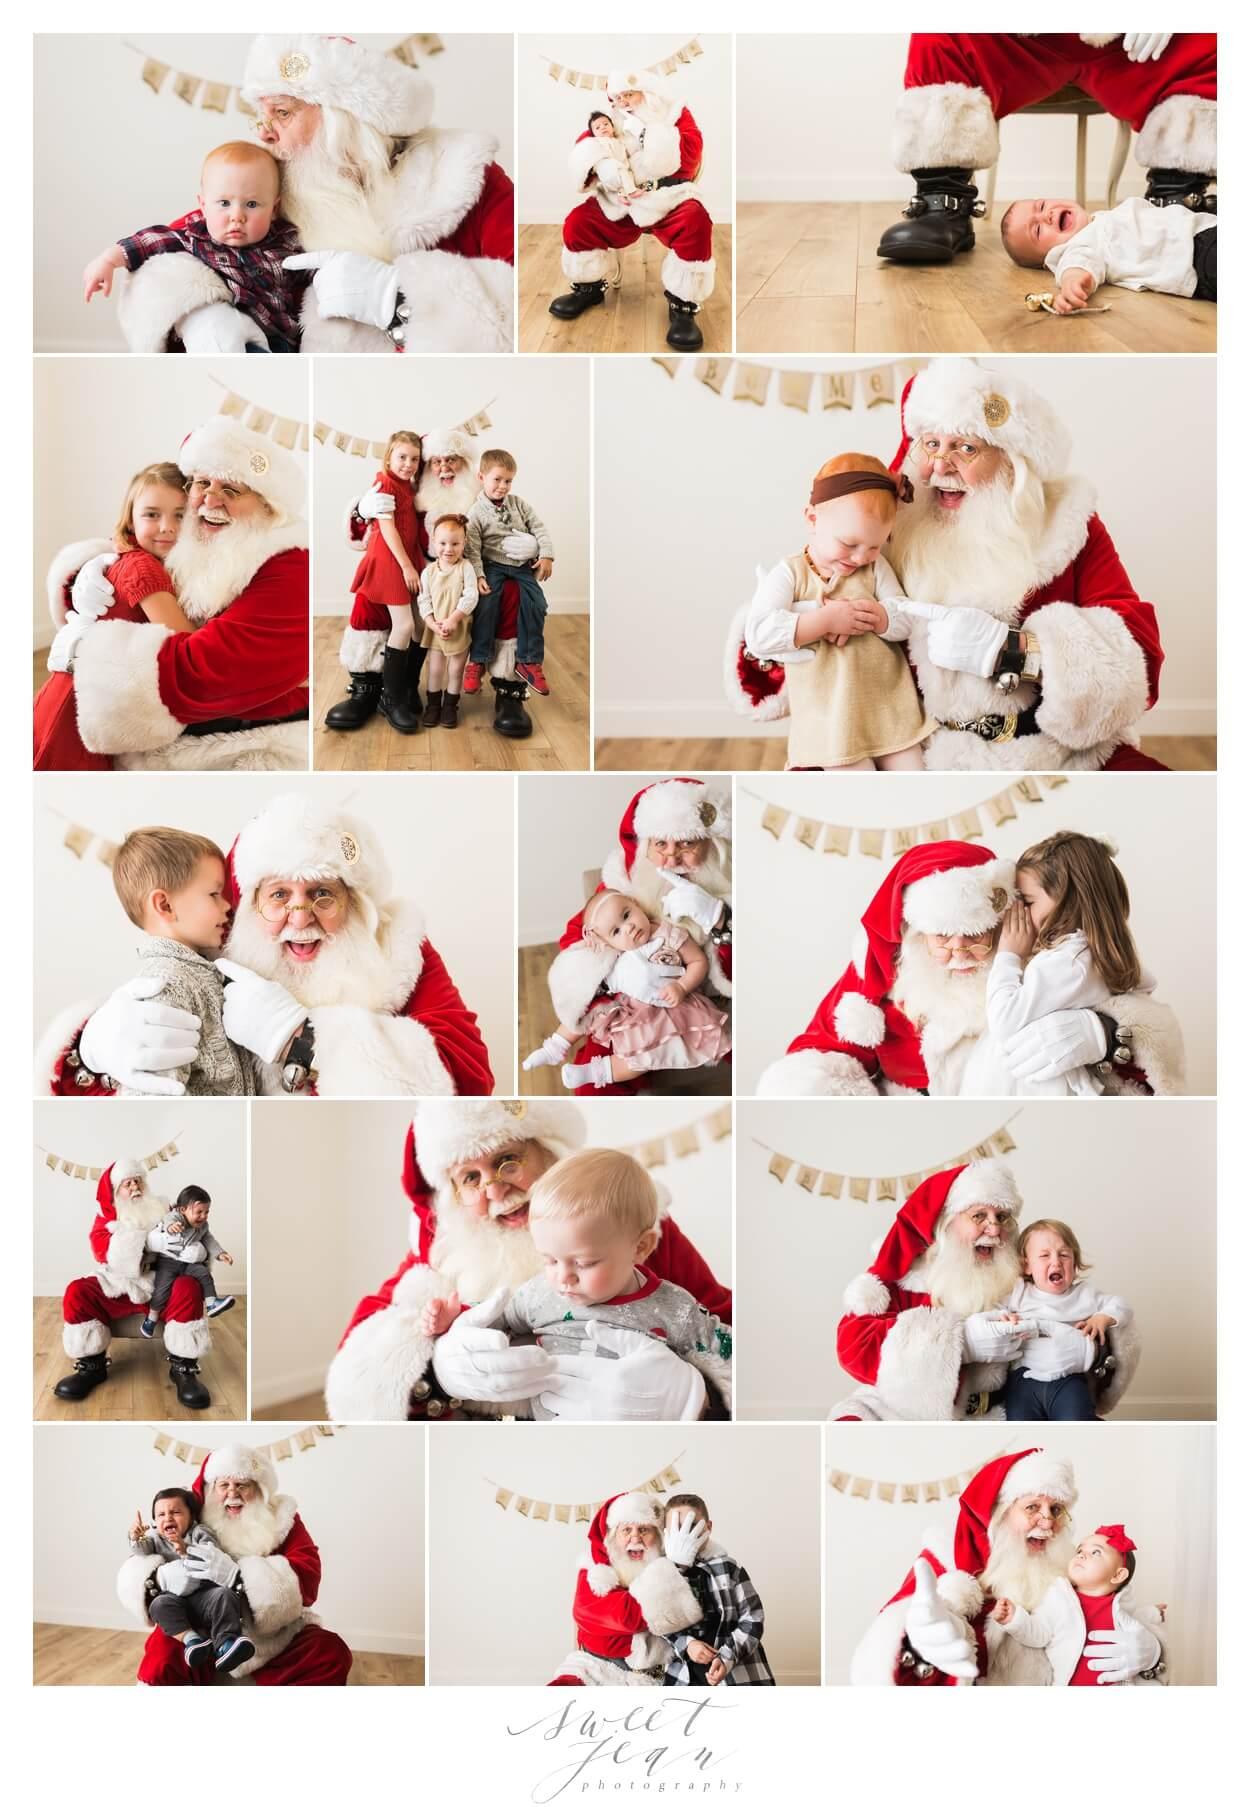 2015 Santa Event Sweet Jean Client Exclusive